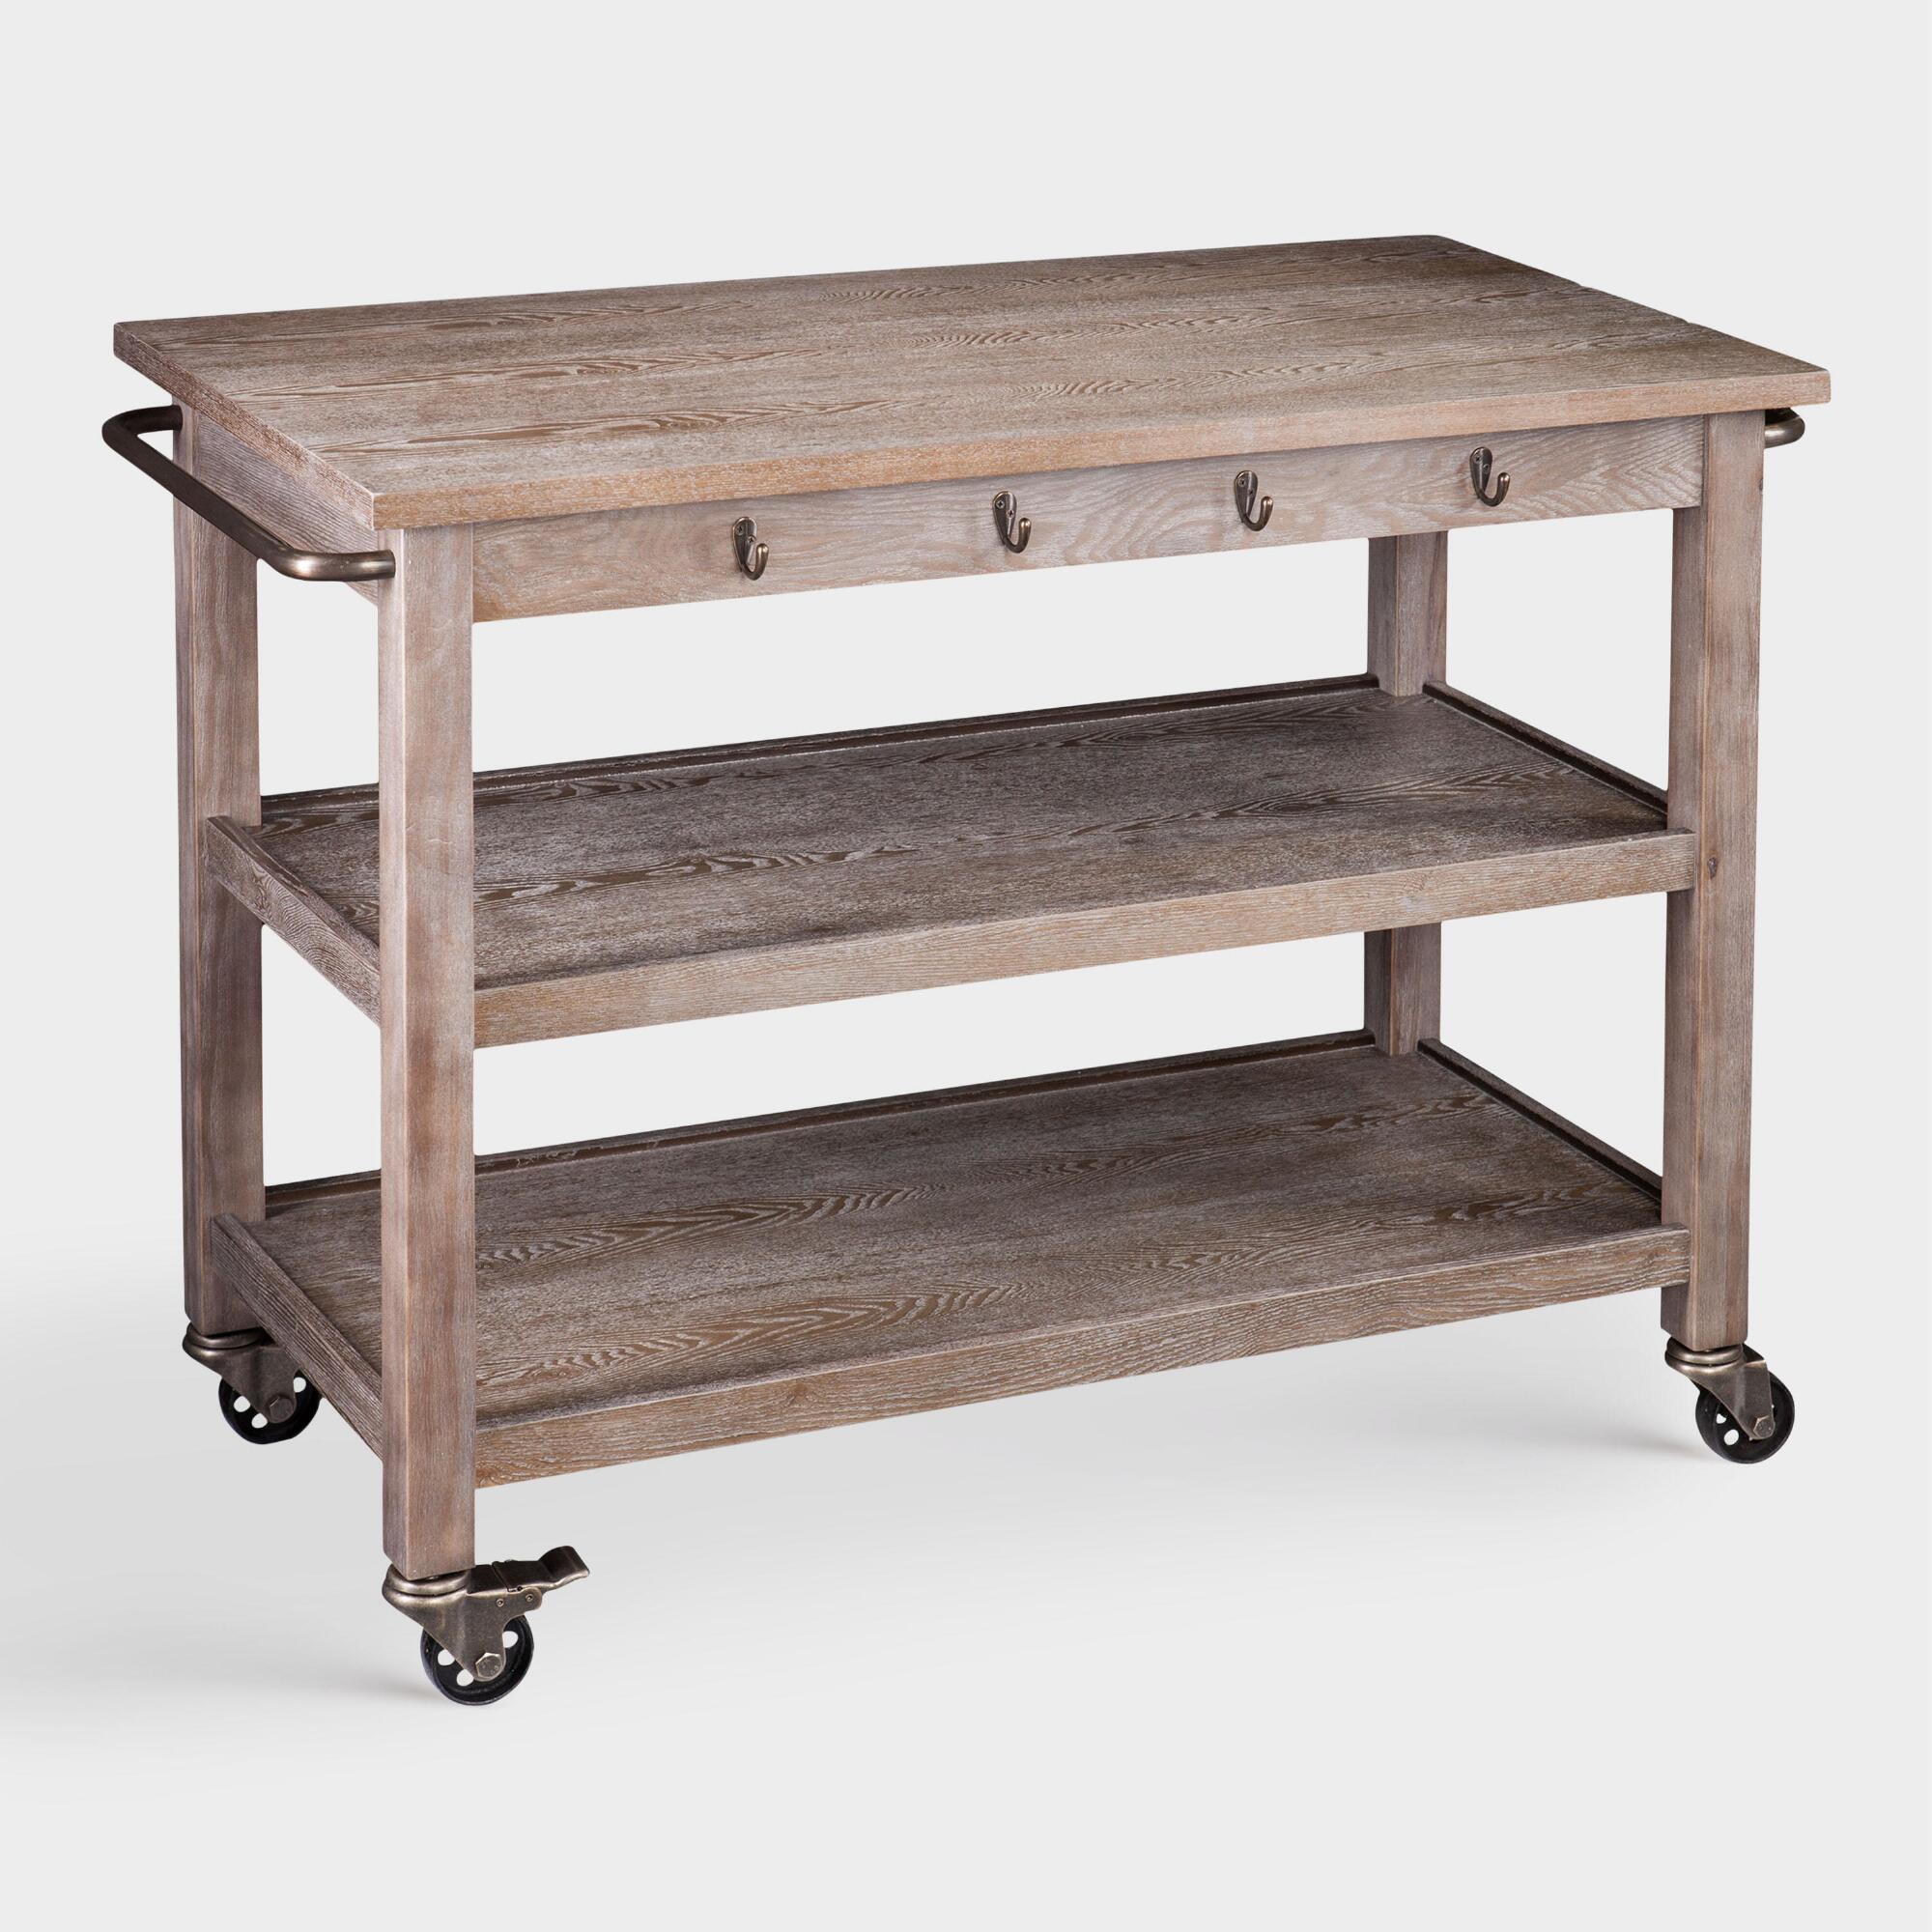 Rustic Oak Wood Dawn Kitchen Cart by World Market | Products ...